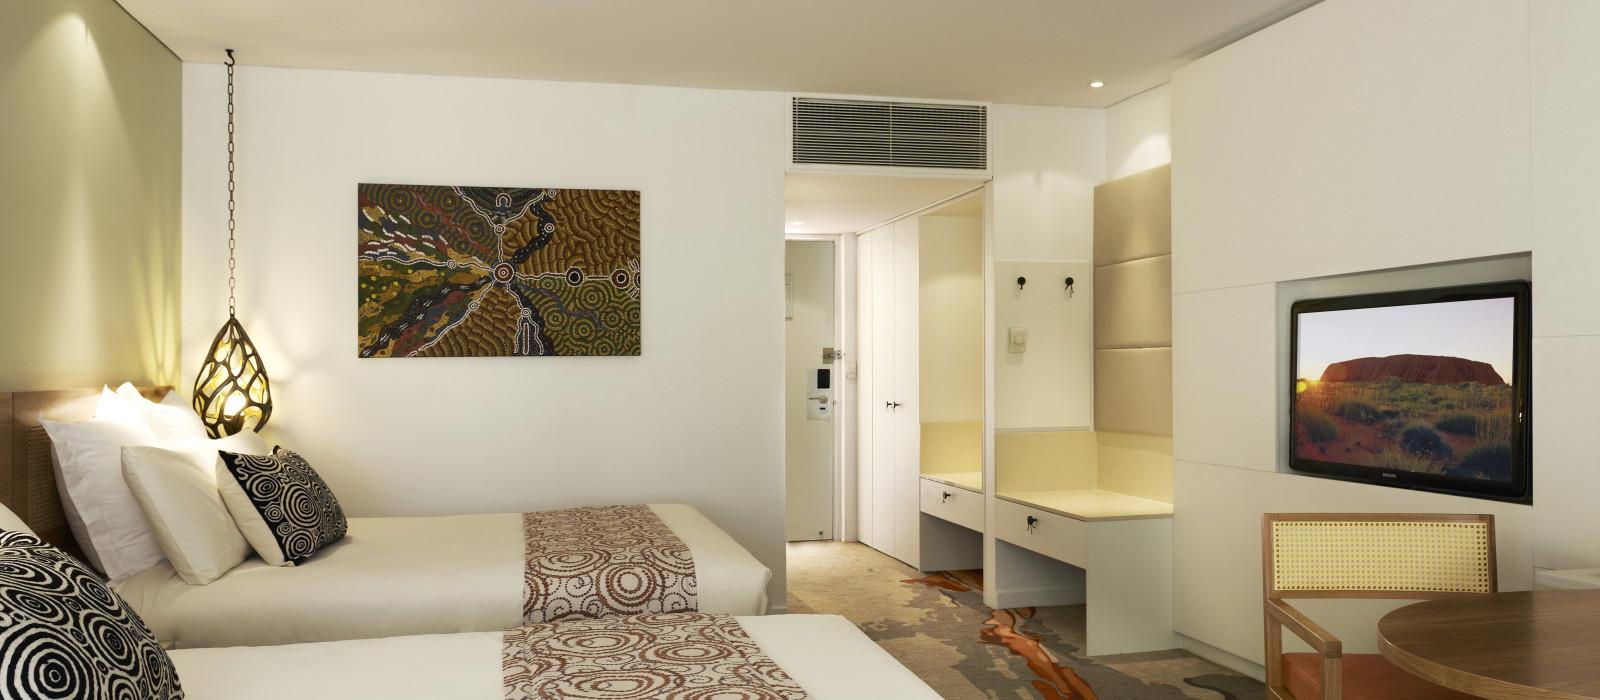 Hotel Voyages Sails In The Desert  Australia